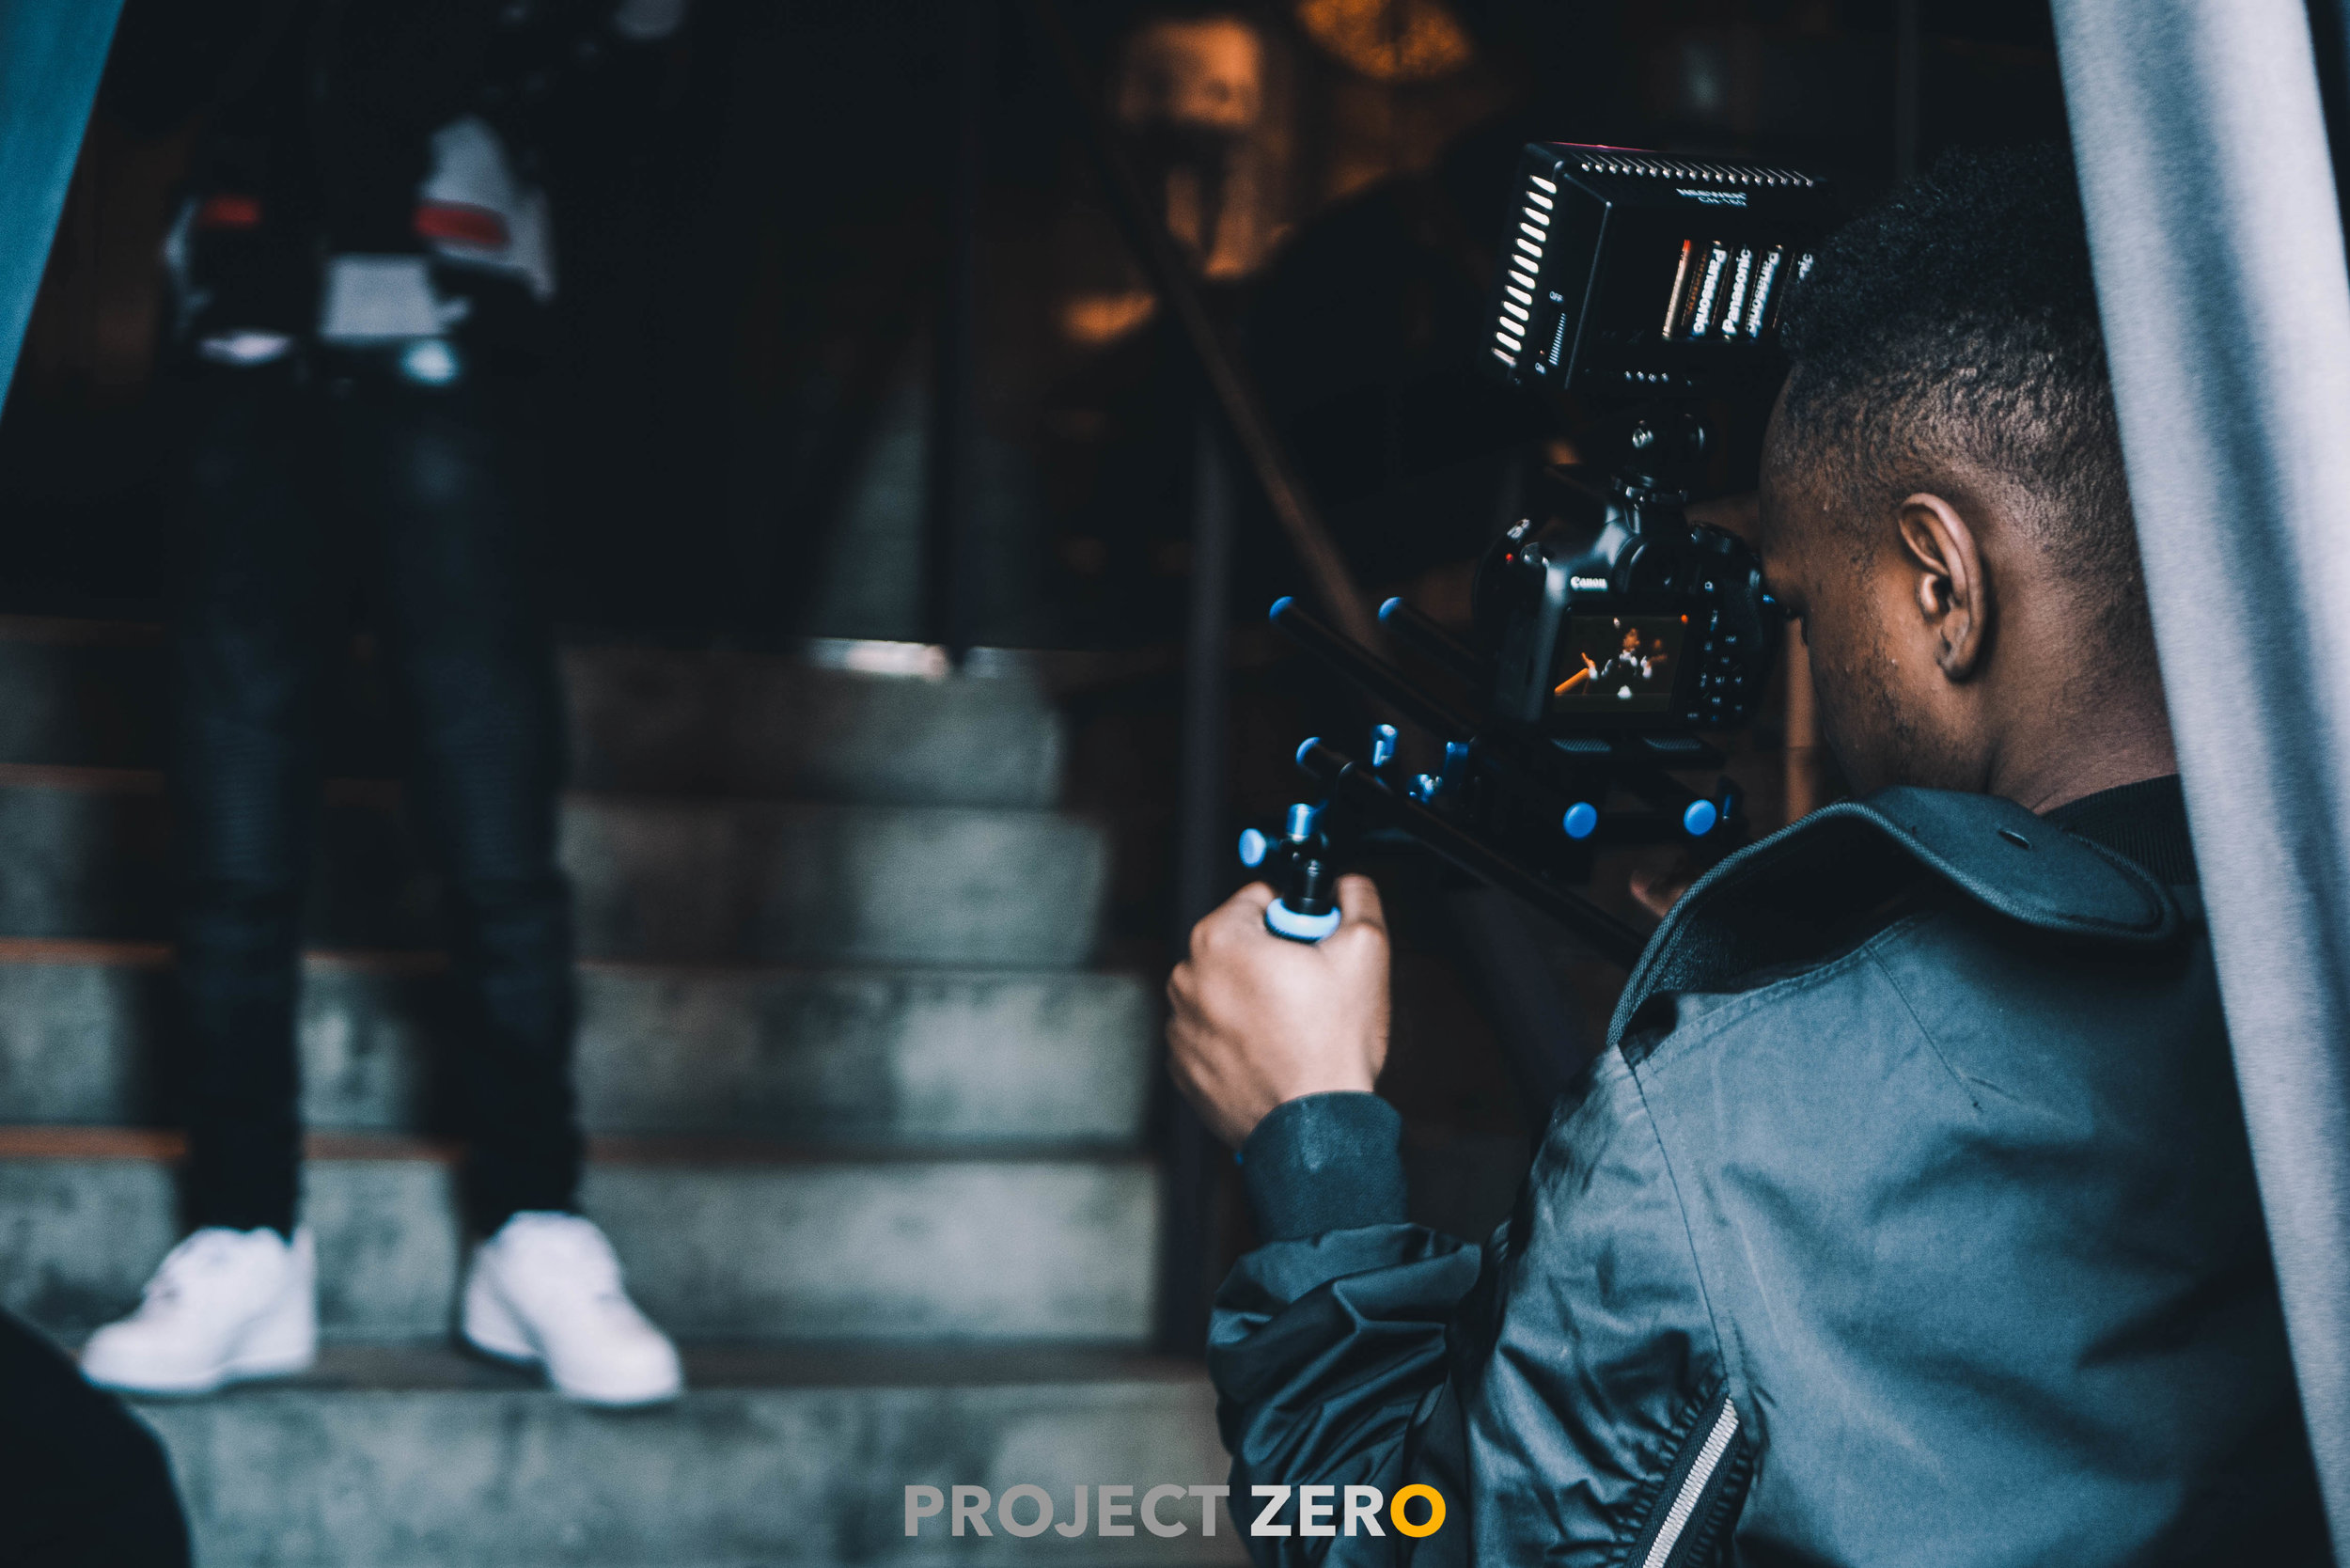 project-zero-21.jpg